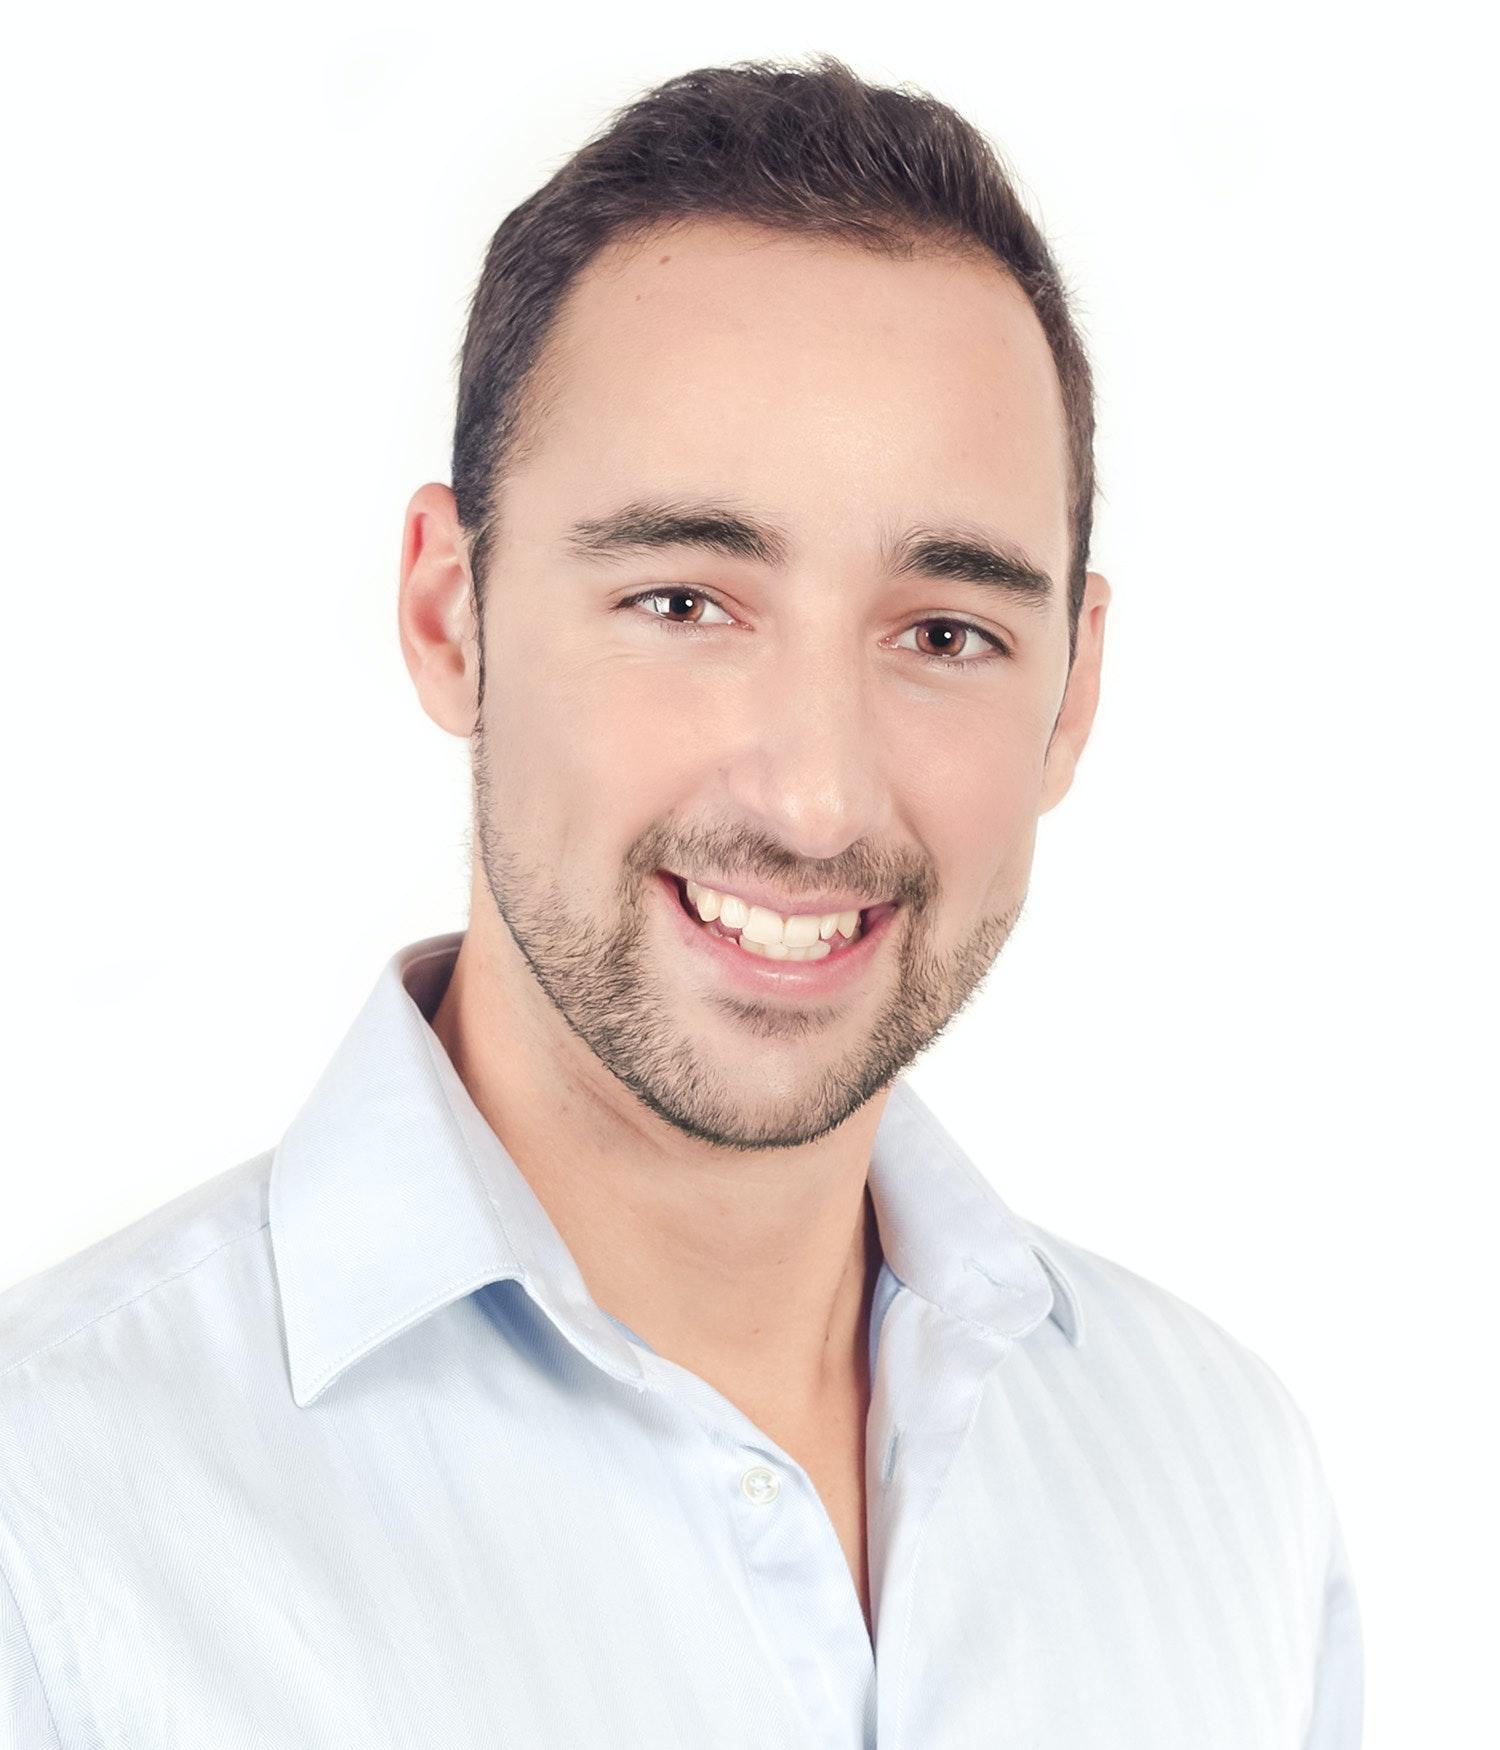 Francisco Javier Burgos Gutierrez